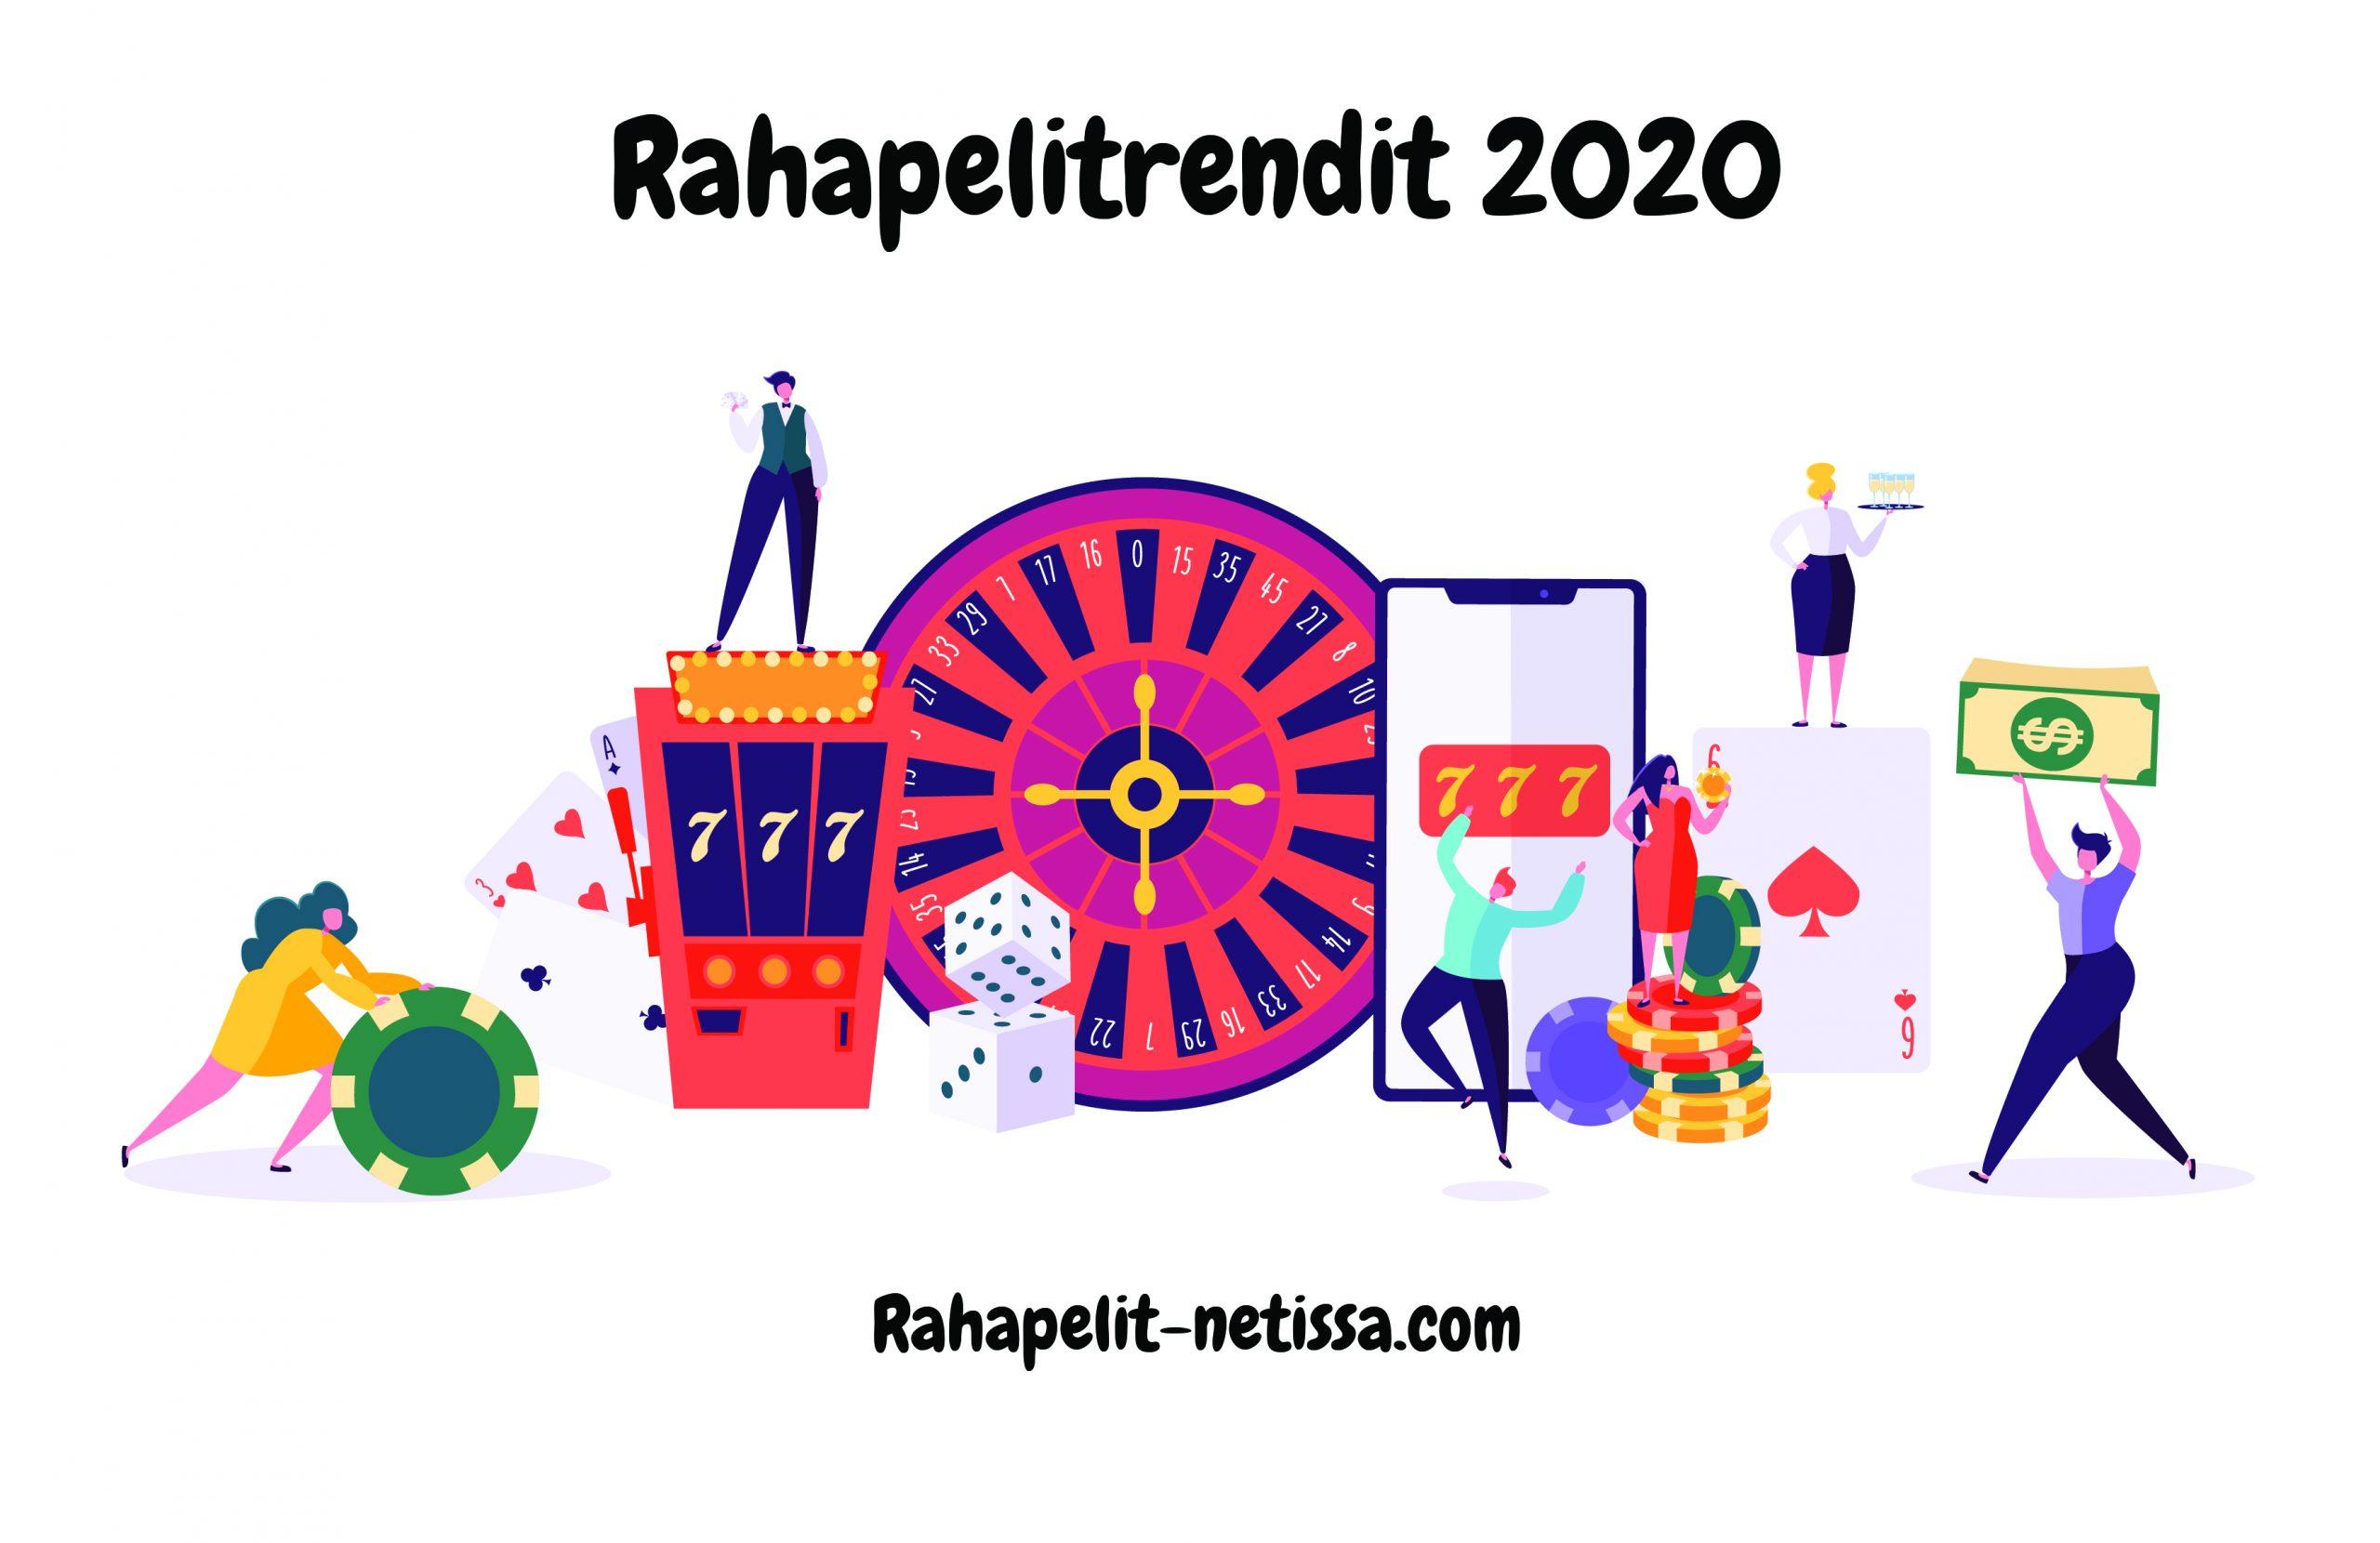 Rahapelitrendit 2020